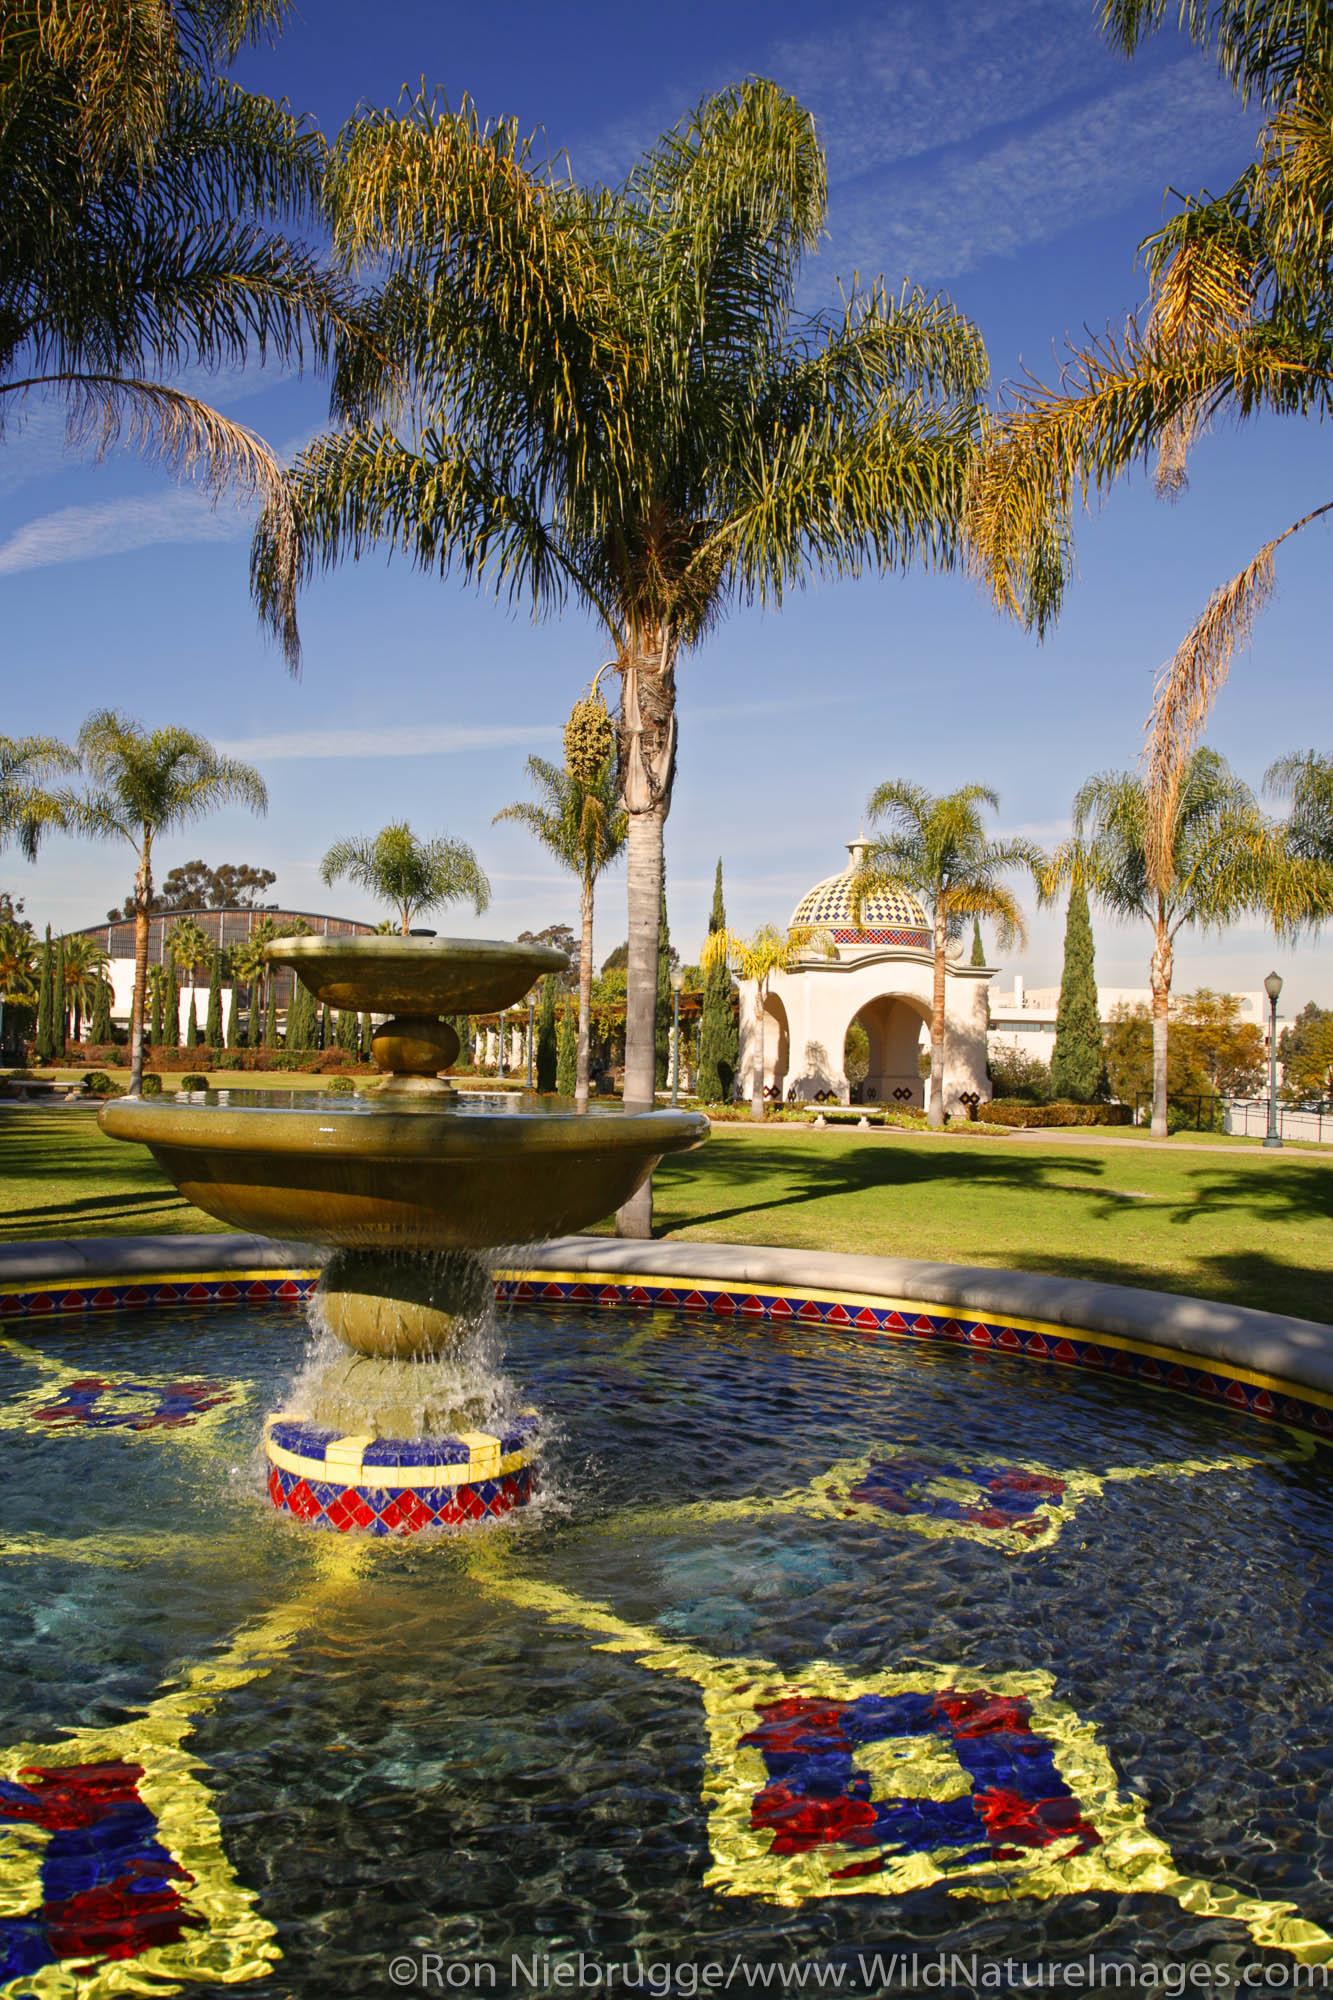 Gardens at the U.S. Naval Hospital, Balboa Park, San Diego, California.